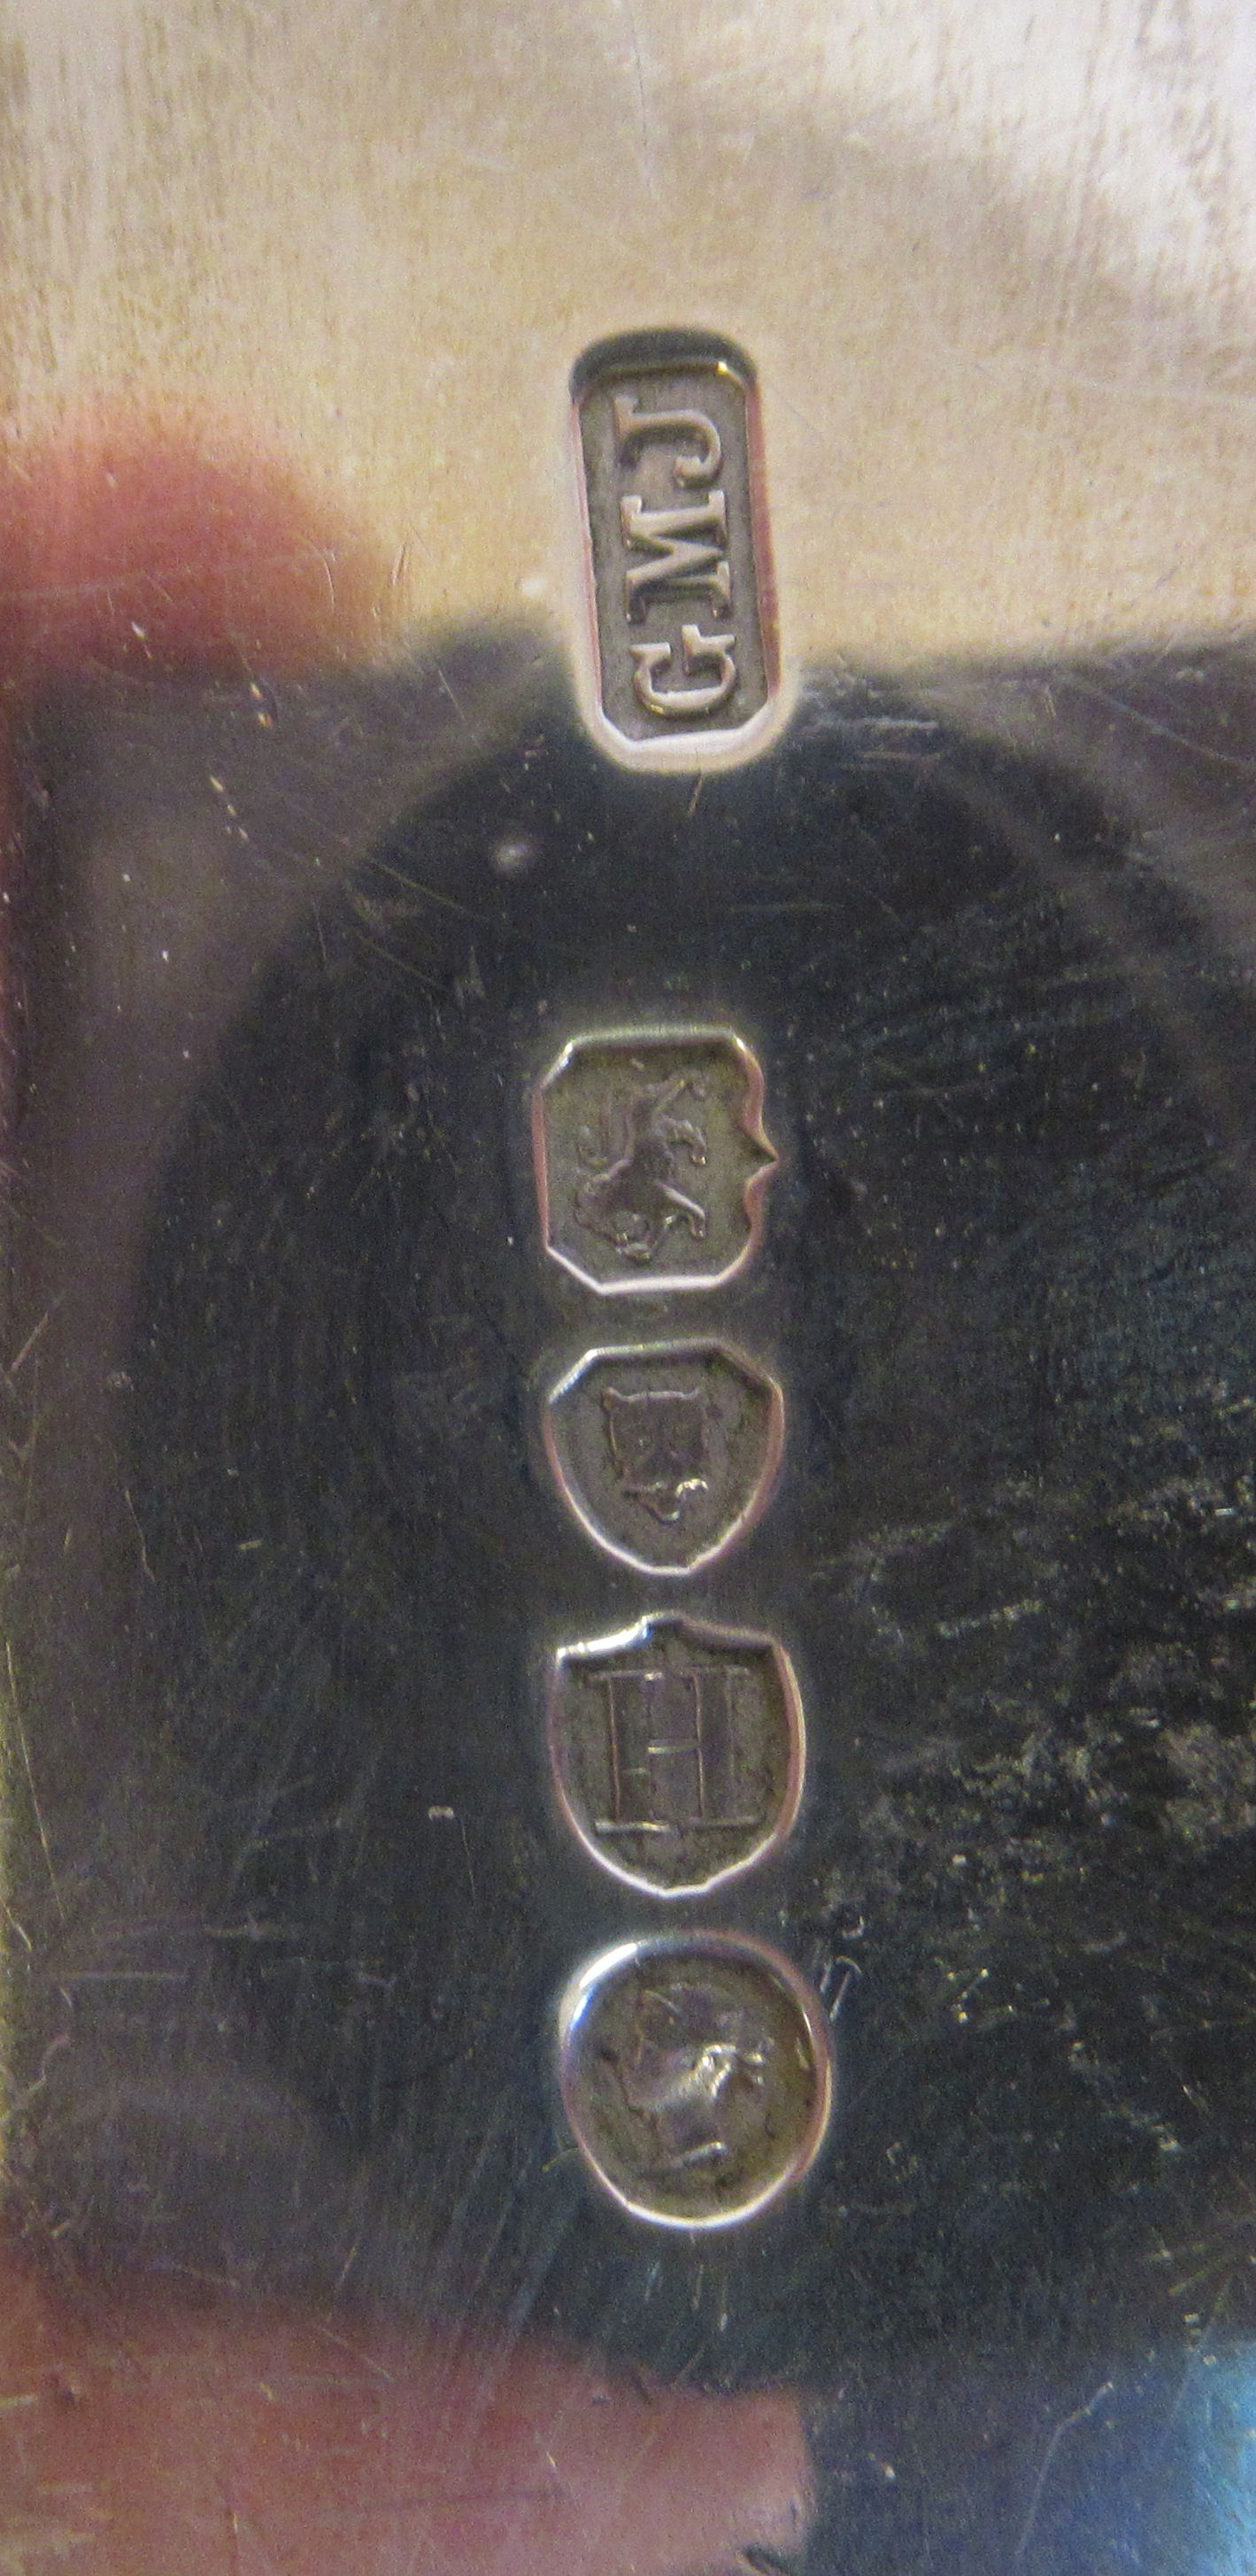 A late Victorian silver fiddle pattern basting spoonGeorge Maudsley JacksonLondon 1883 - Image 3 of 3